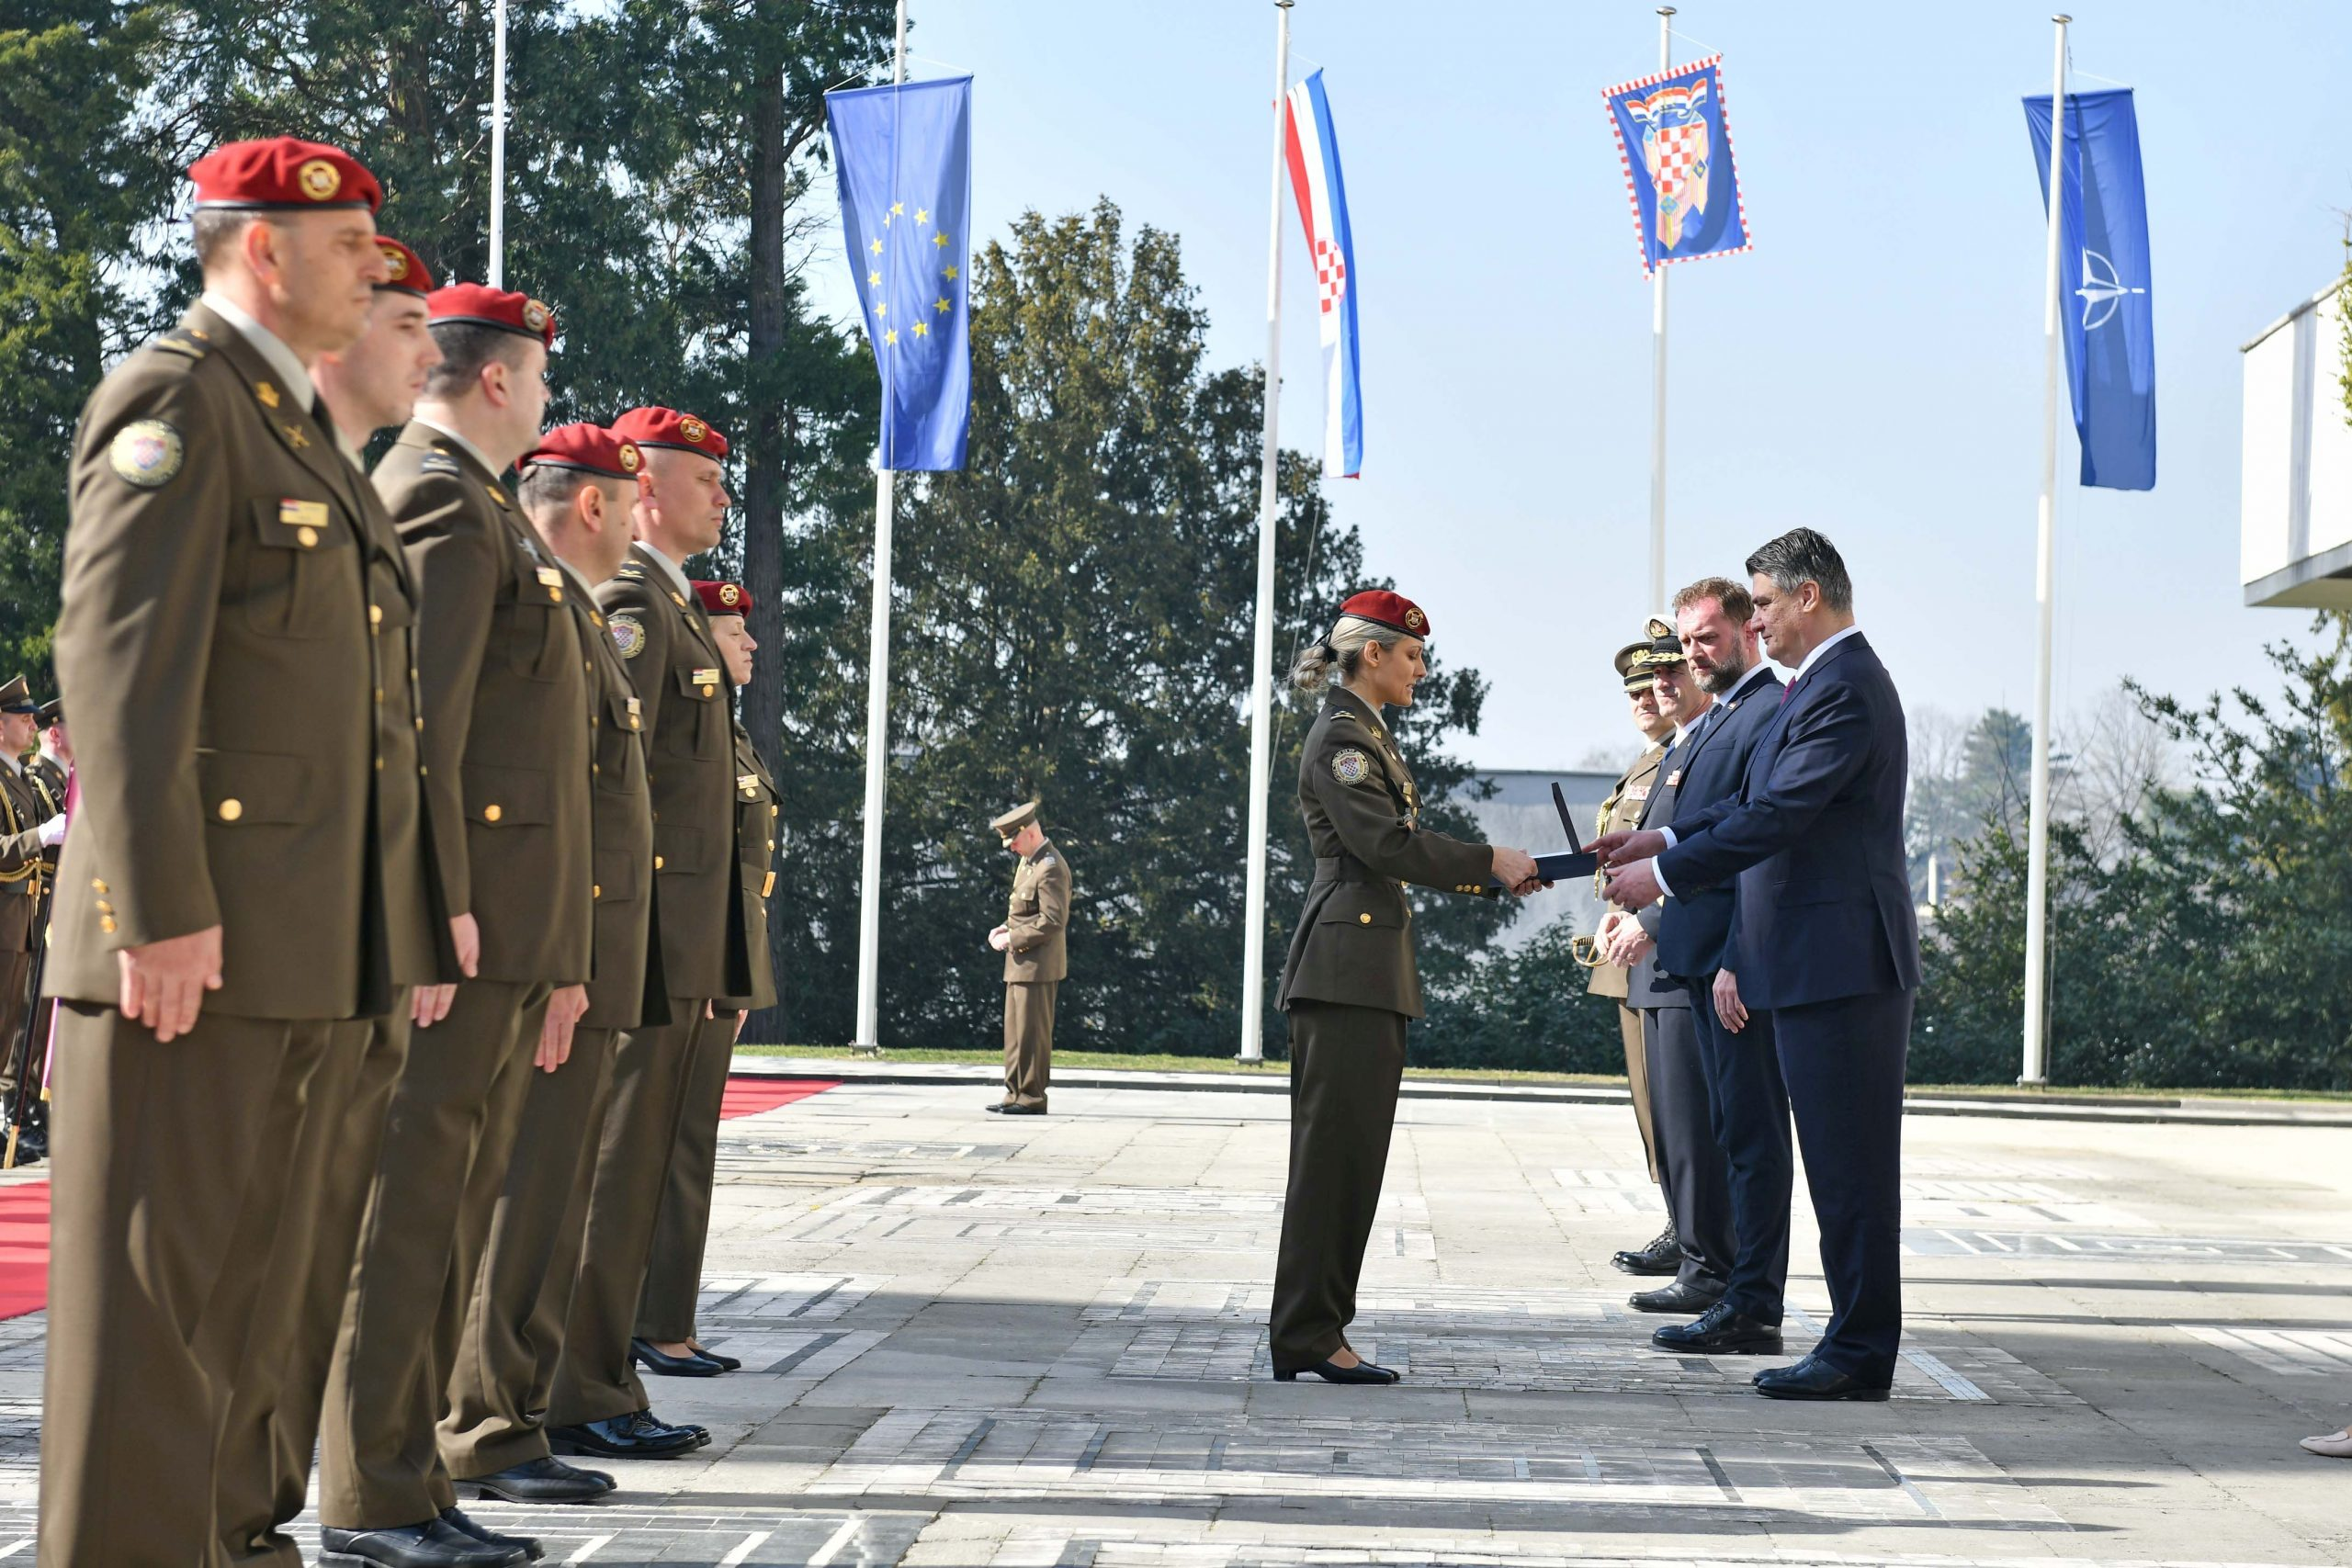 27th anniversary of Croatia's Honorary Protection Battalion marked 2